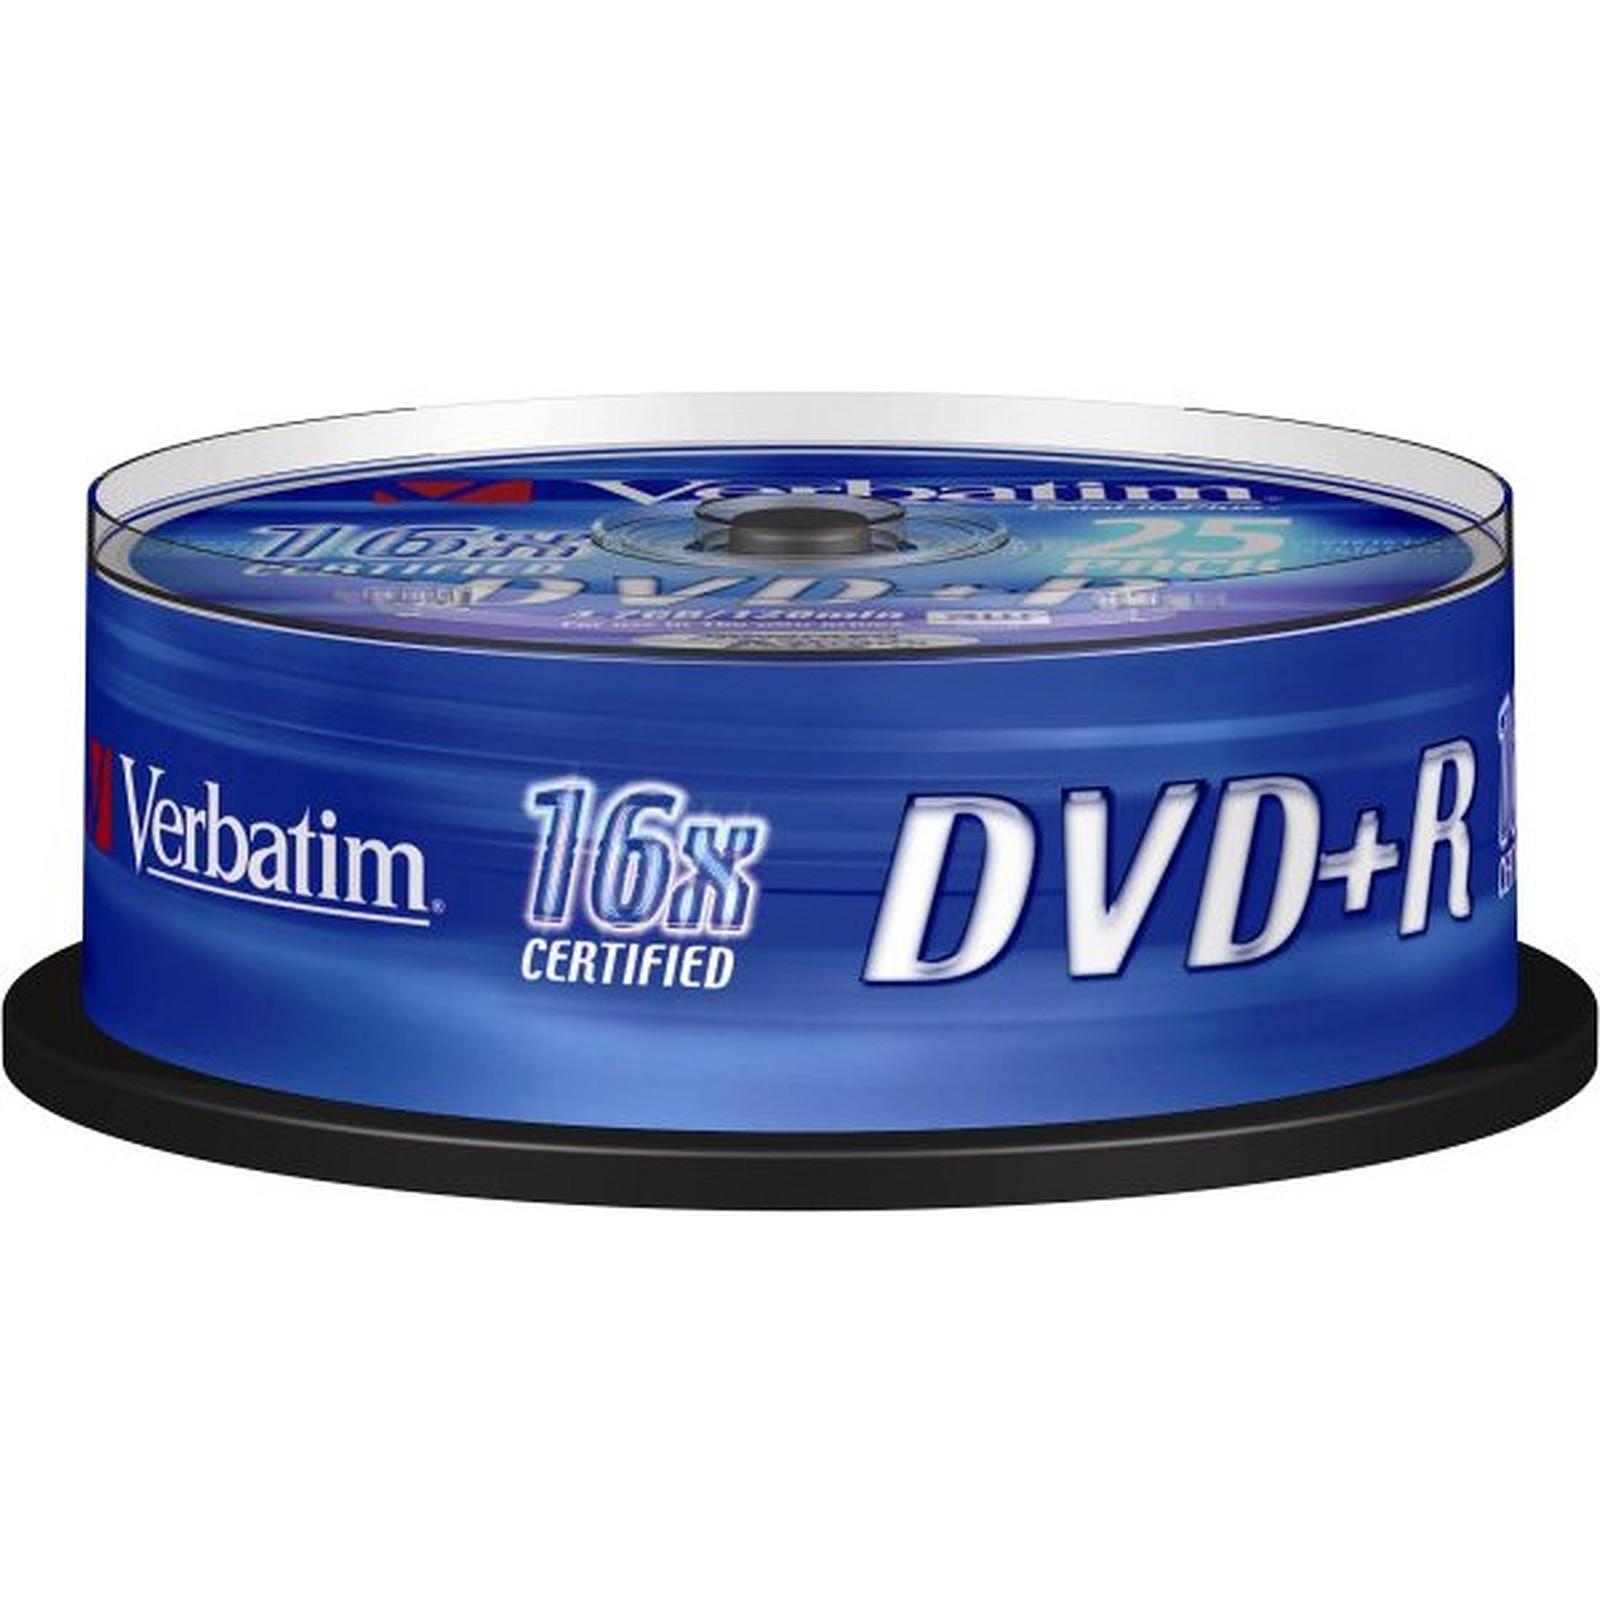 Verbatim DVD+R 4.7 Go 16x (par 25, spindle)